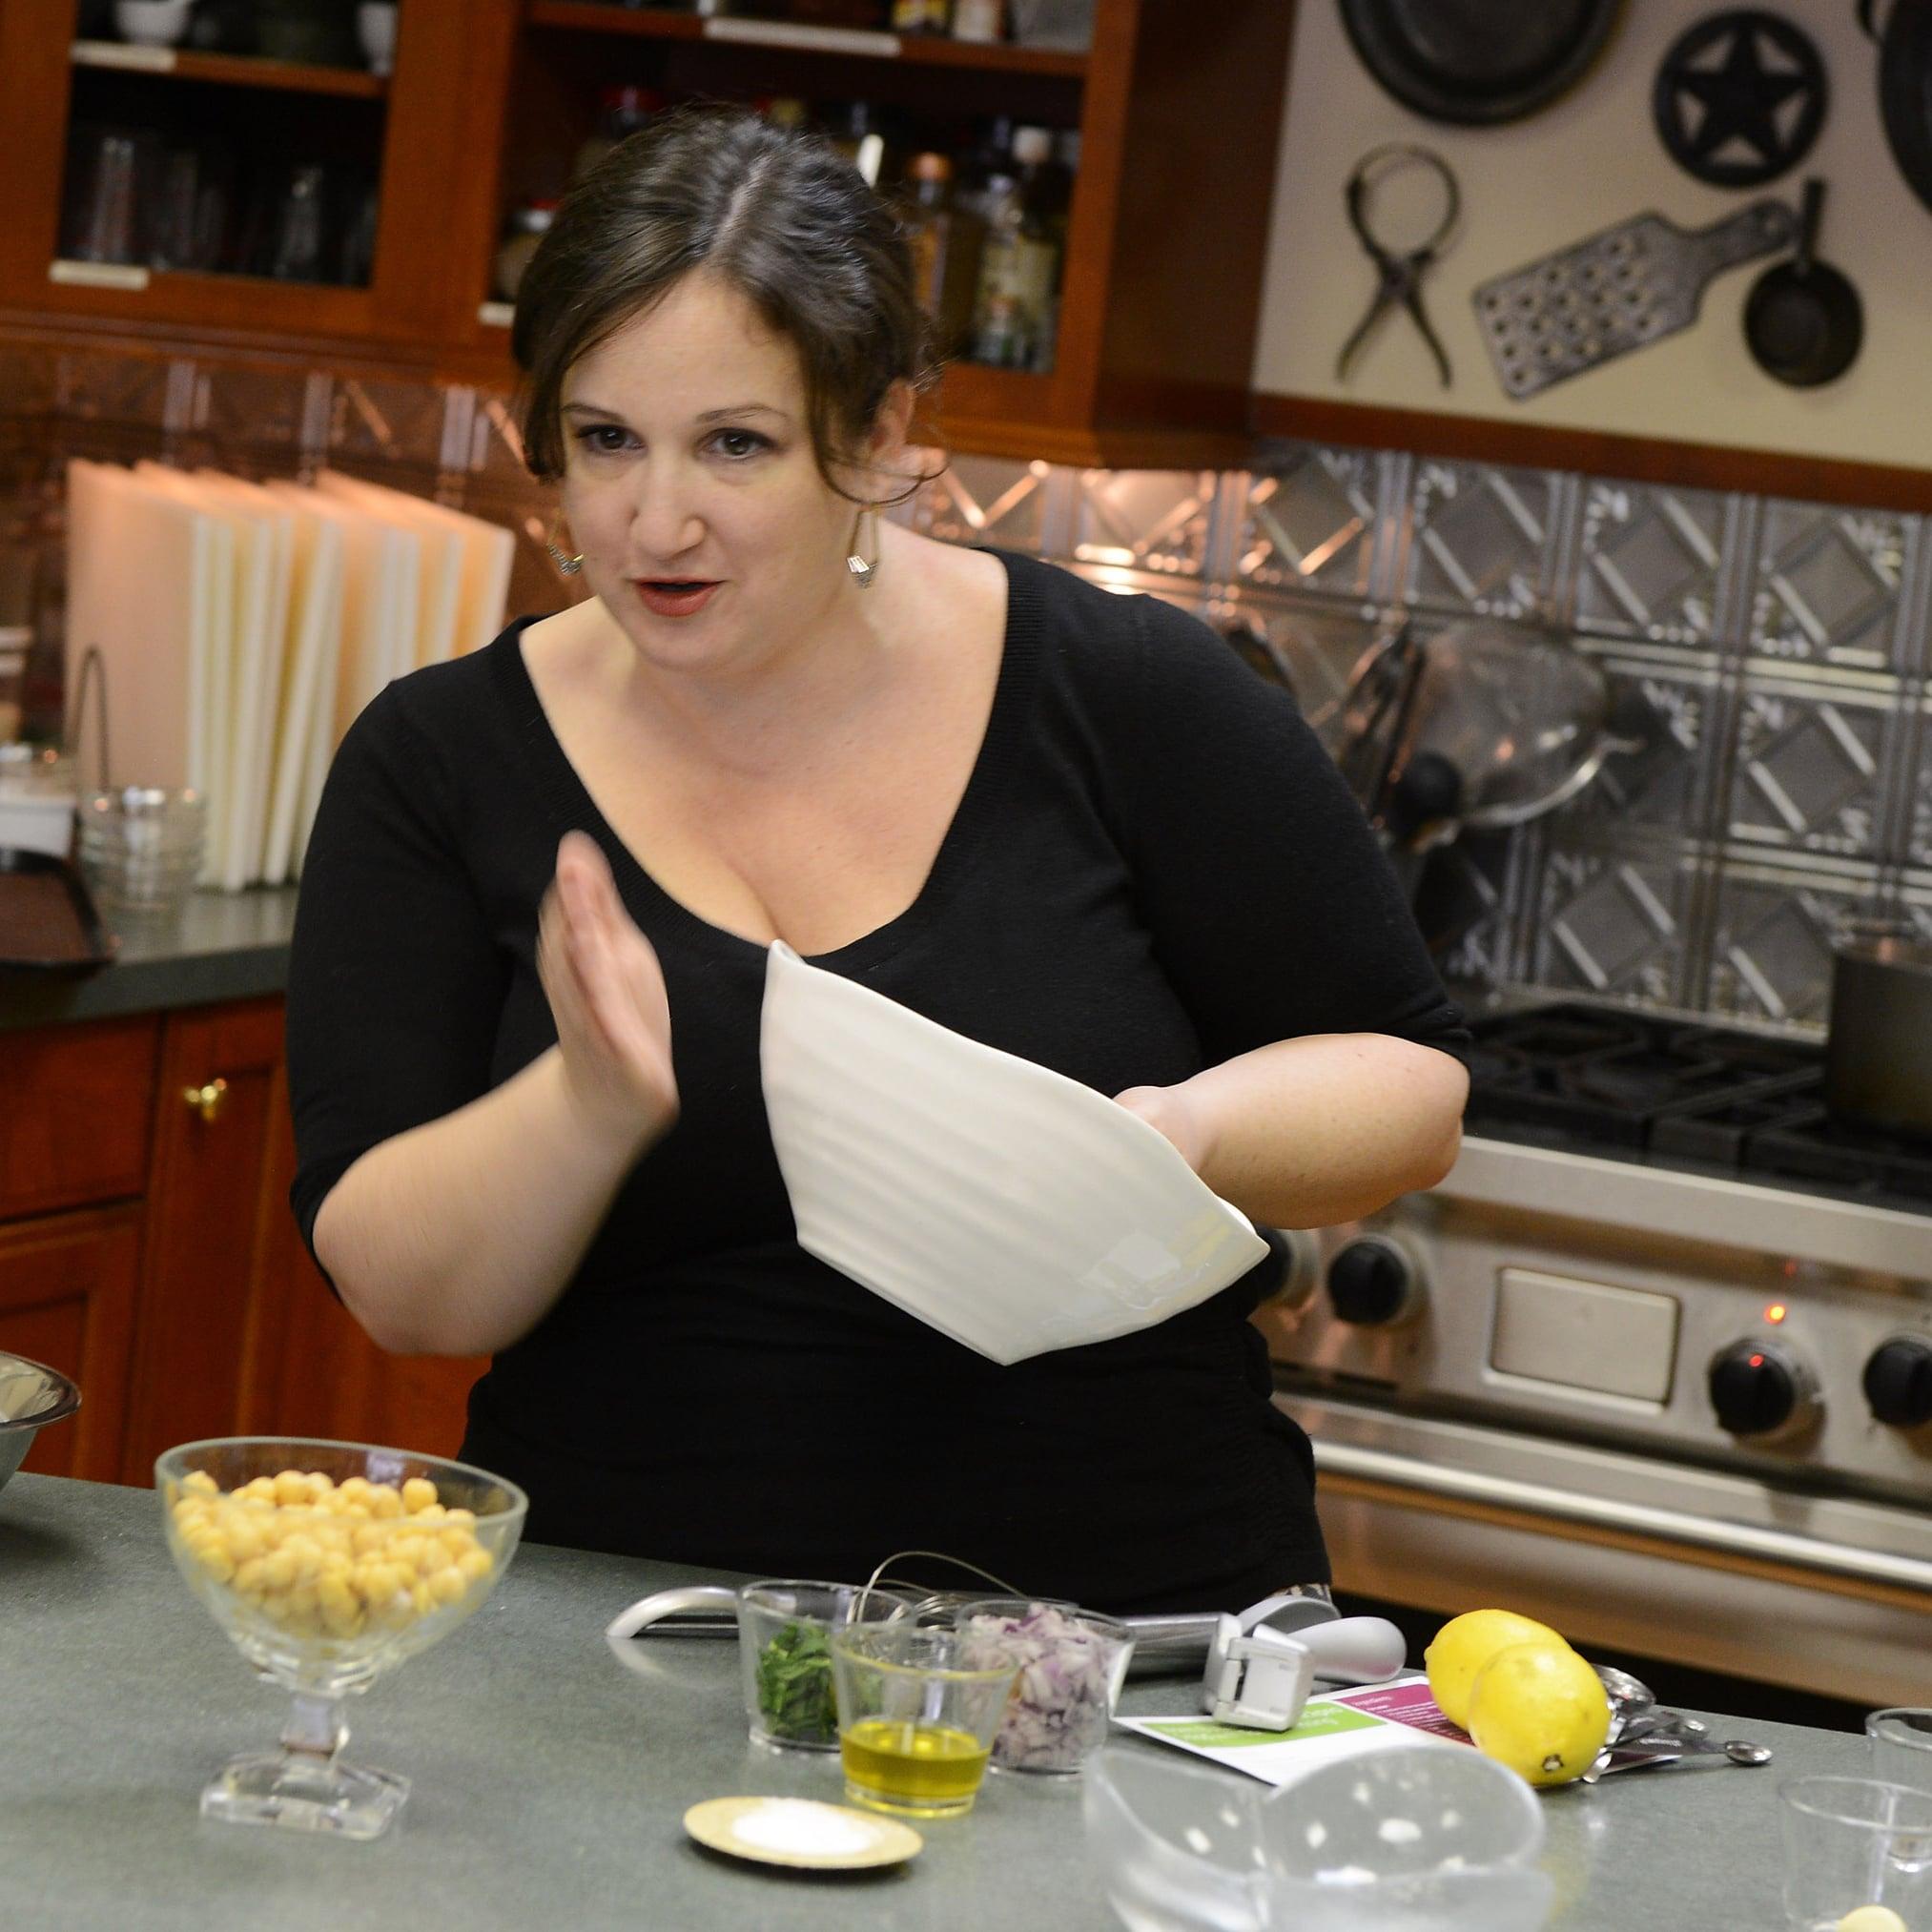 Deb Perelman Husband smitten kitchen fun facts | popsugar food